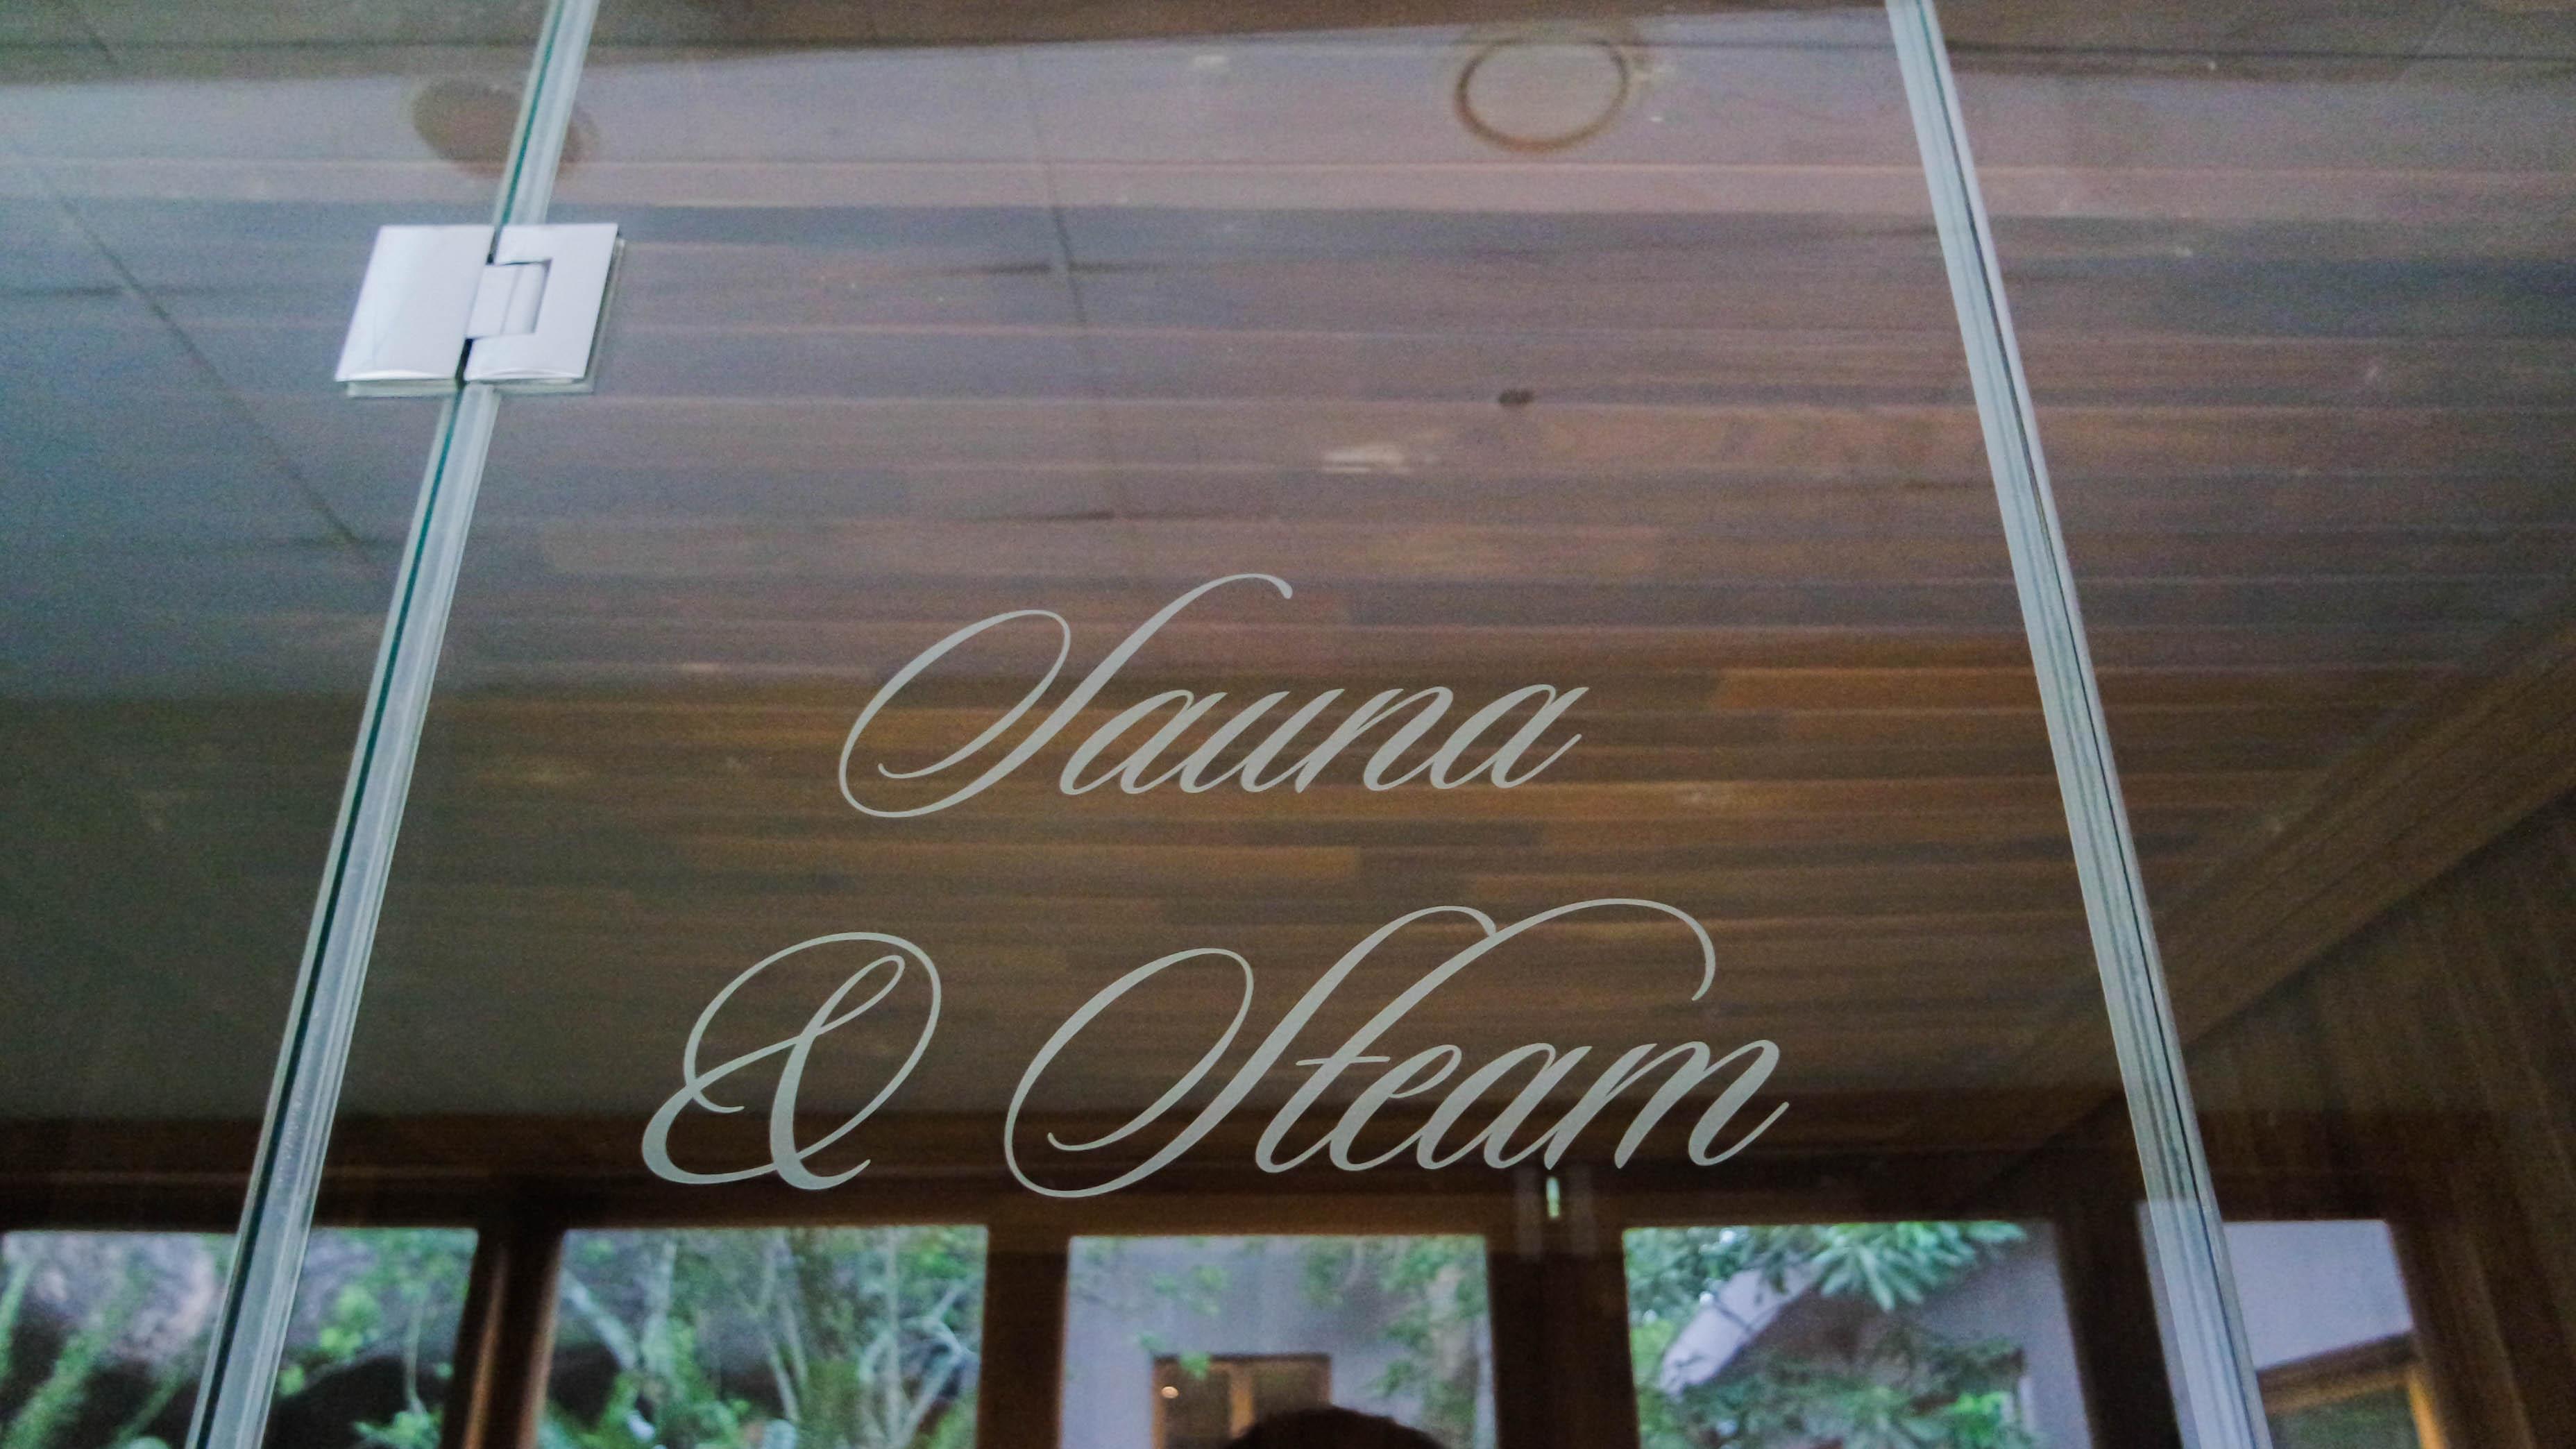 karkloof safari spa sauna and steam room